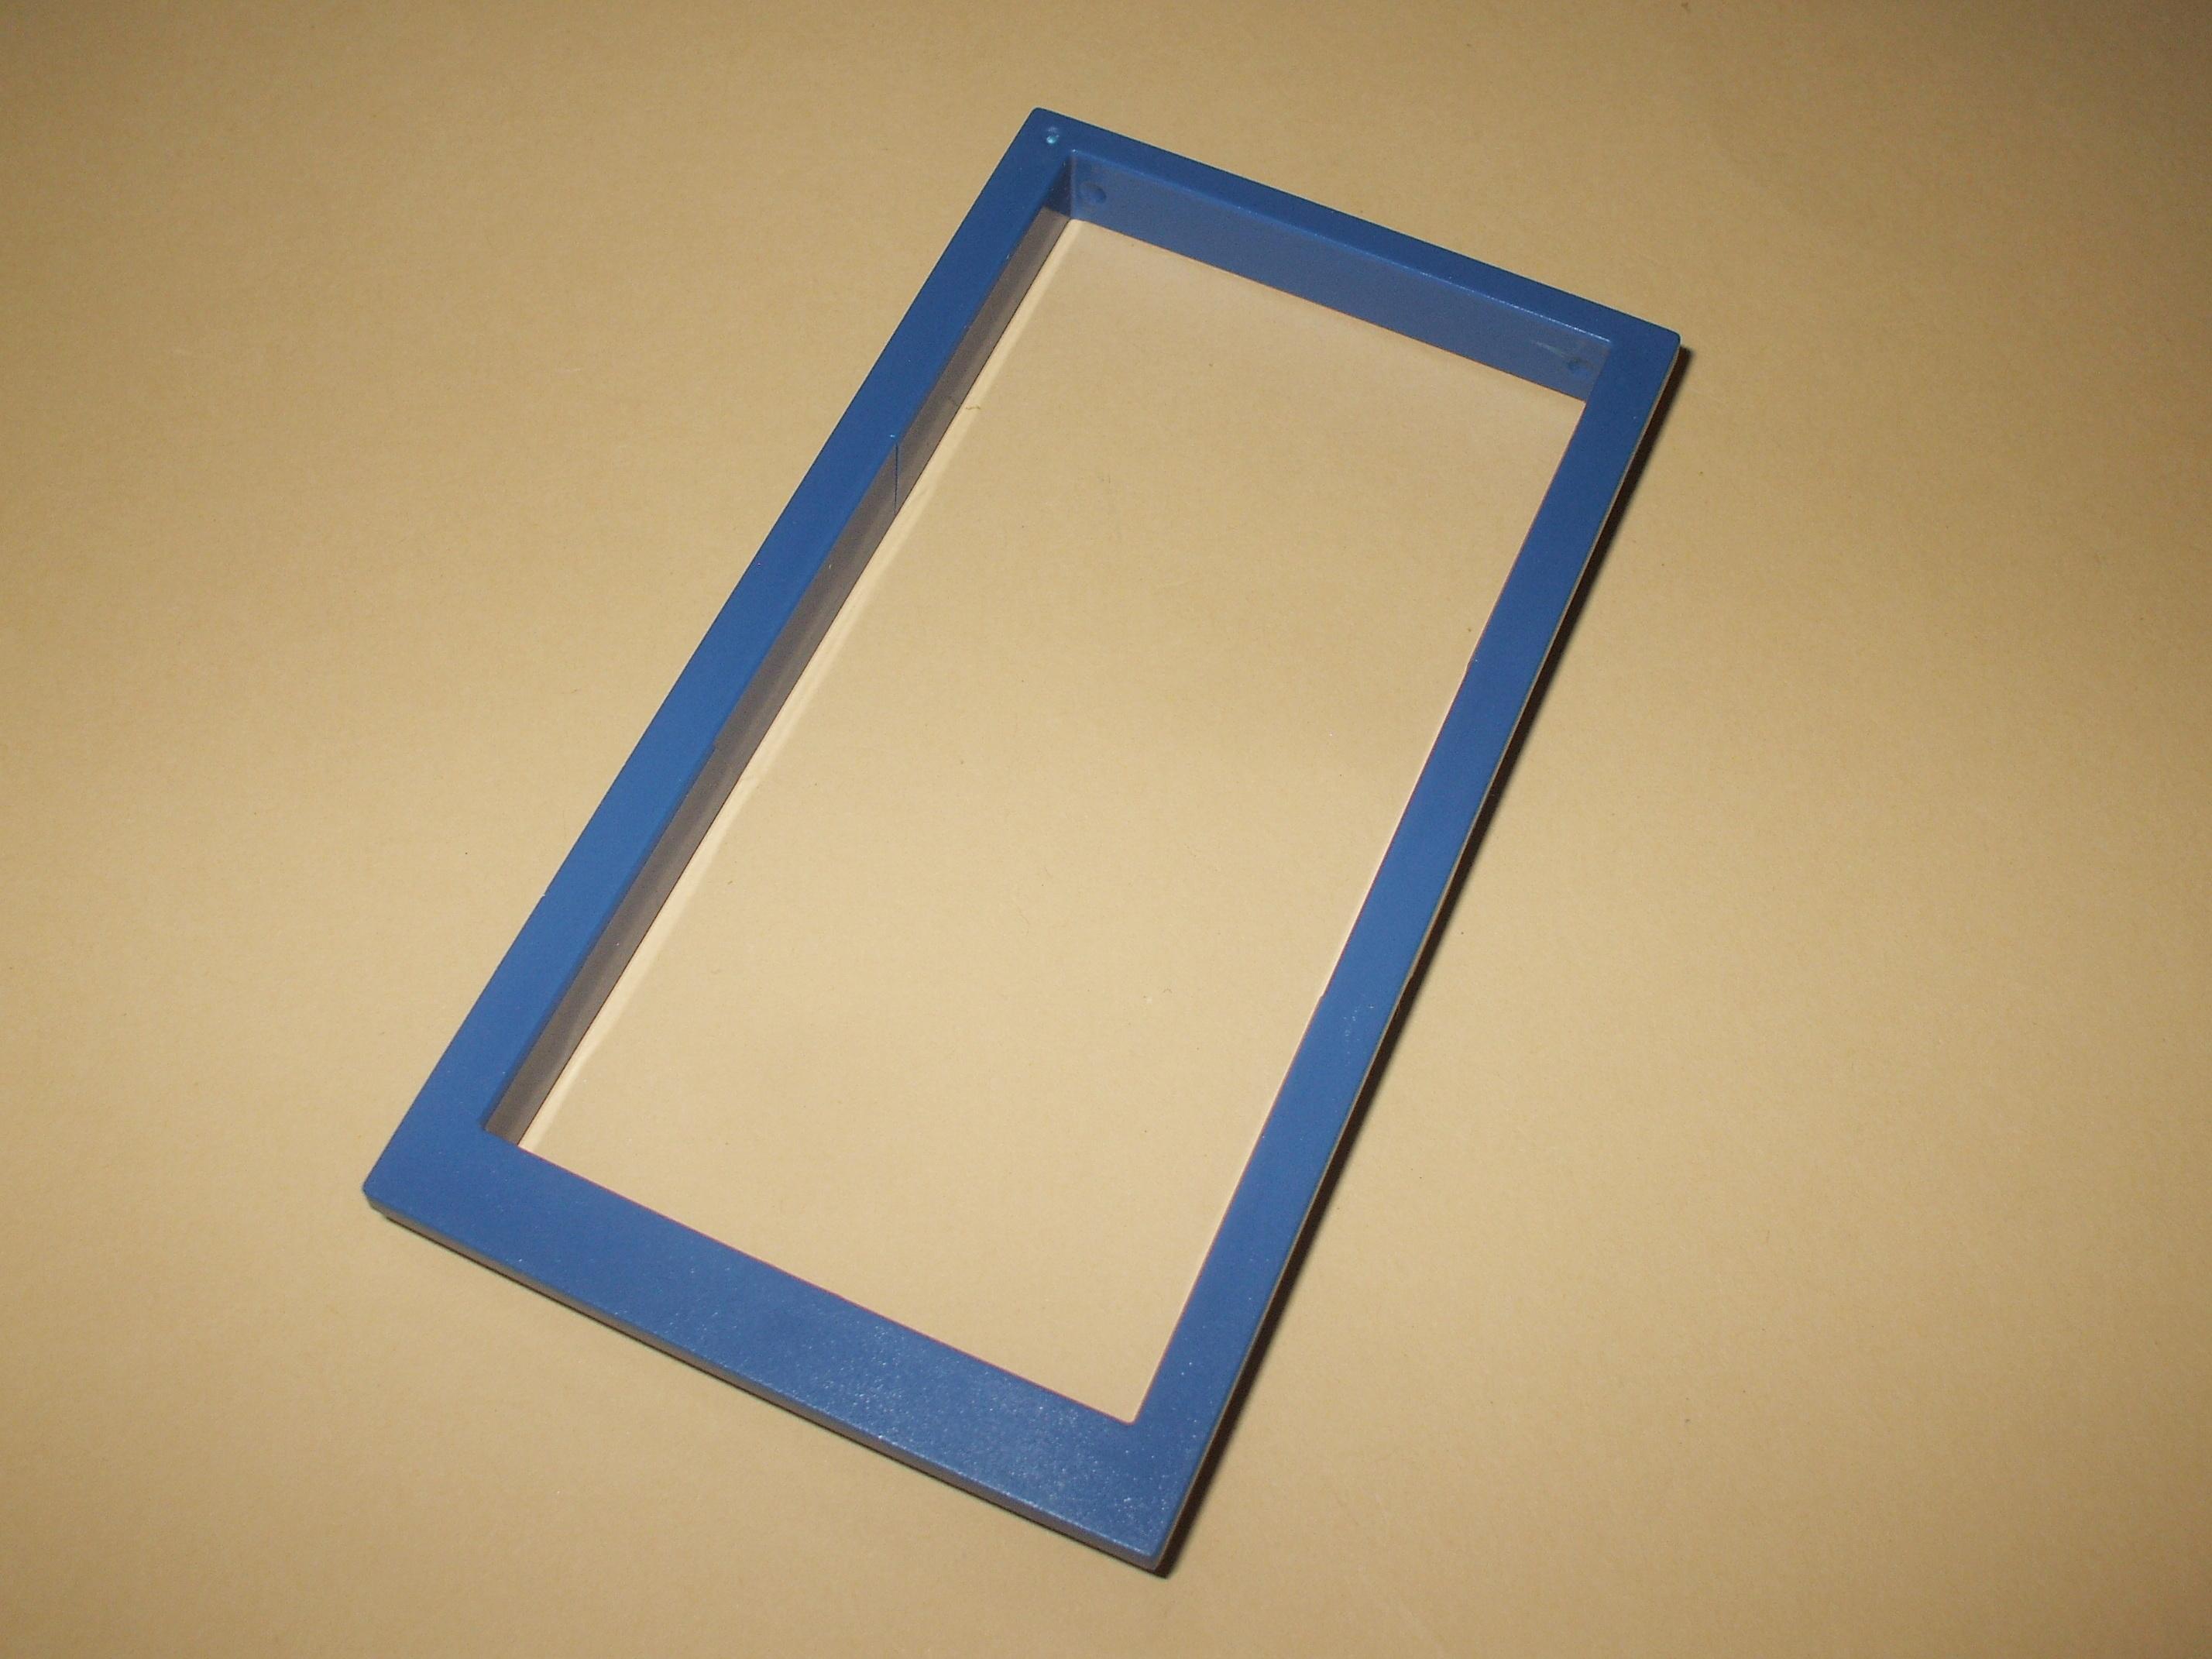 playmobil 30289110 fensterrahmen blau 10x5 cm ersatzteil 4263 4264 ebay. Black Bedroom Furniture Sets. Home Design Ideas